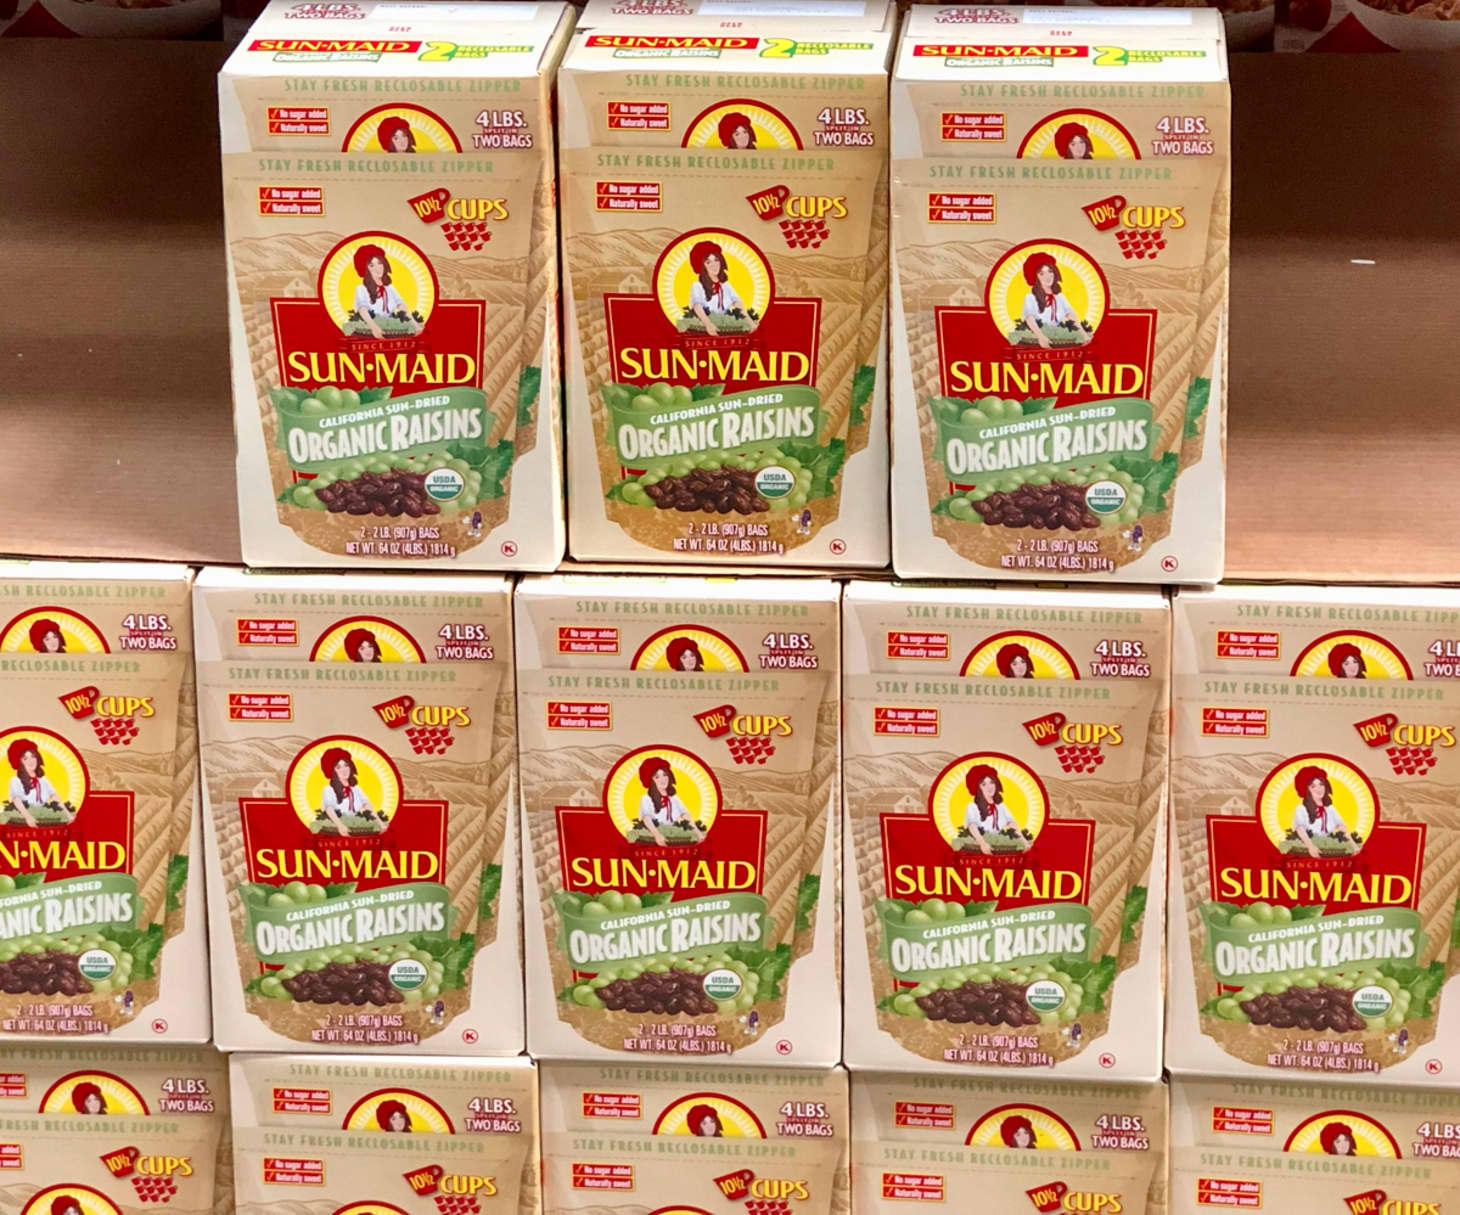 Costco Baking Supplies - Healthy Best | Kitchn